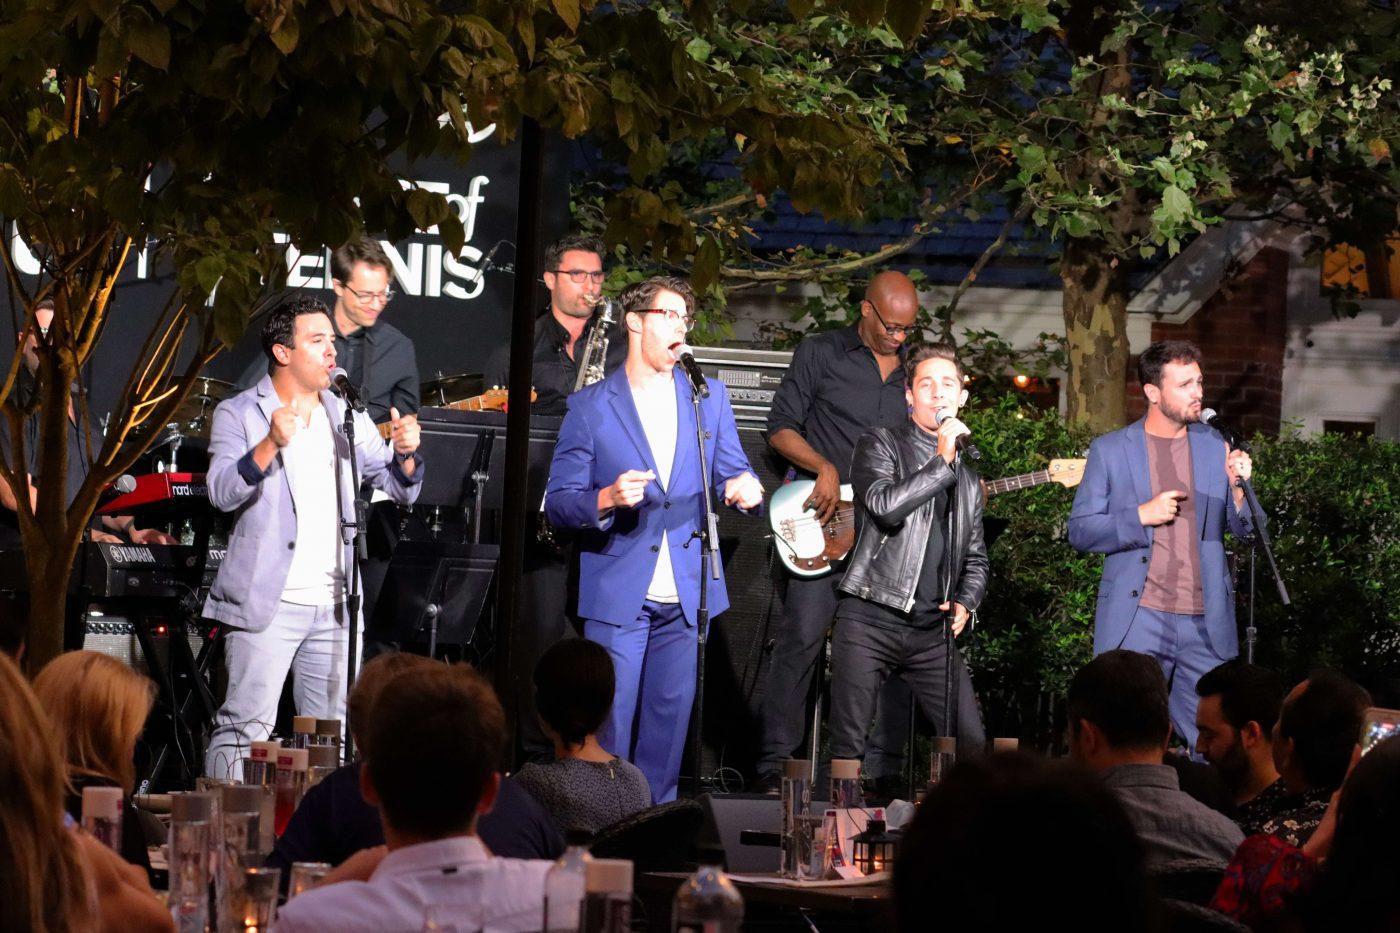 Taste of Tennis – Wanderer Musical Singers at Tavern on the Green